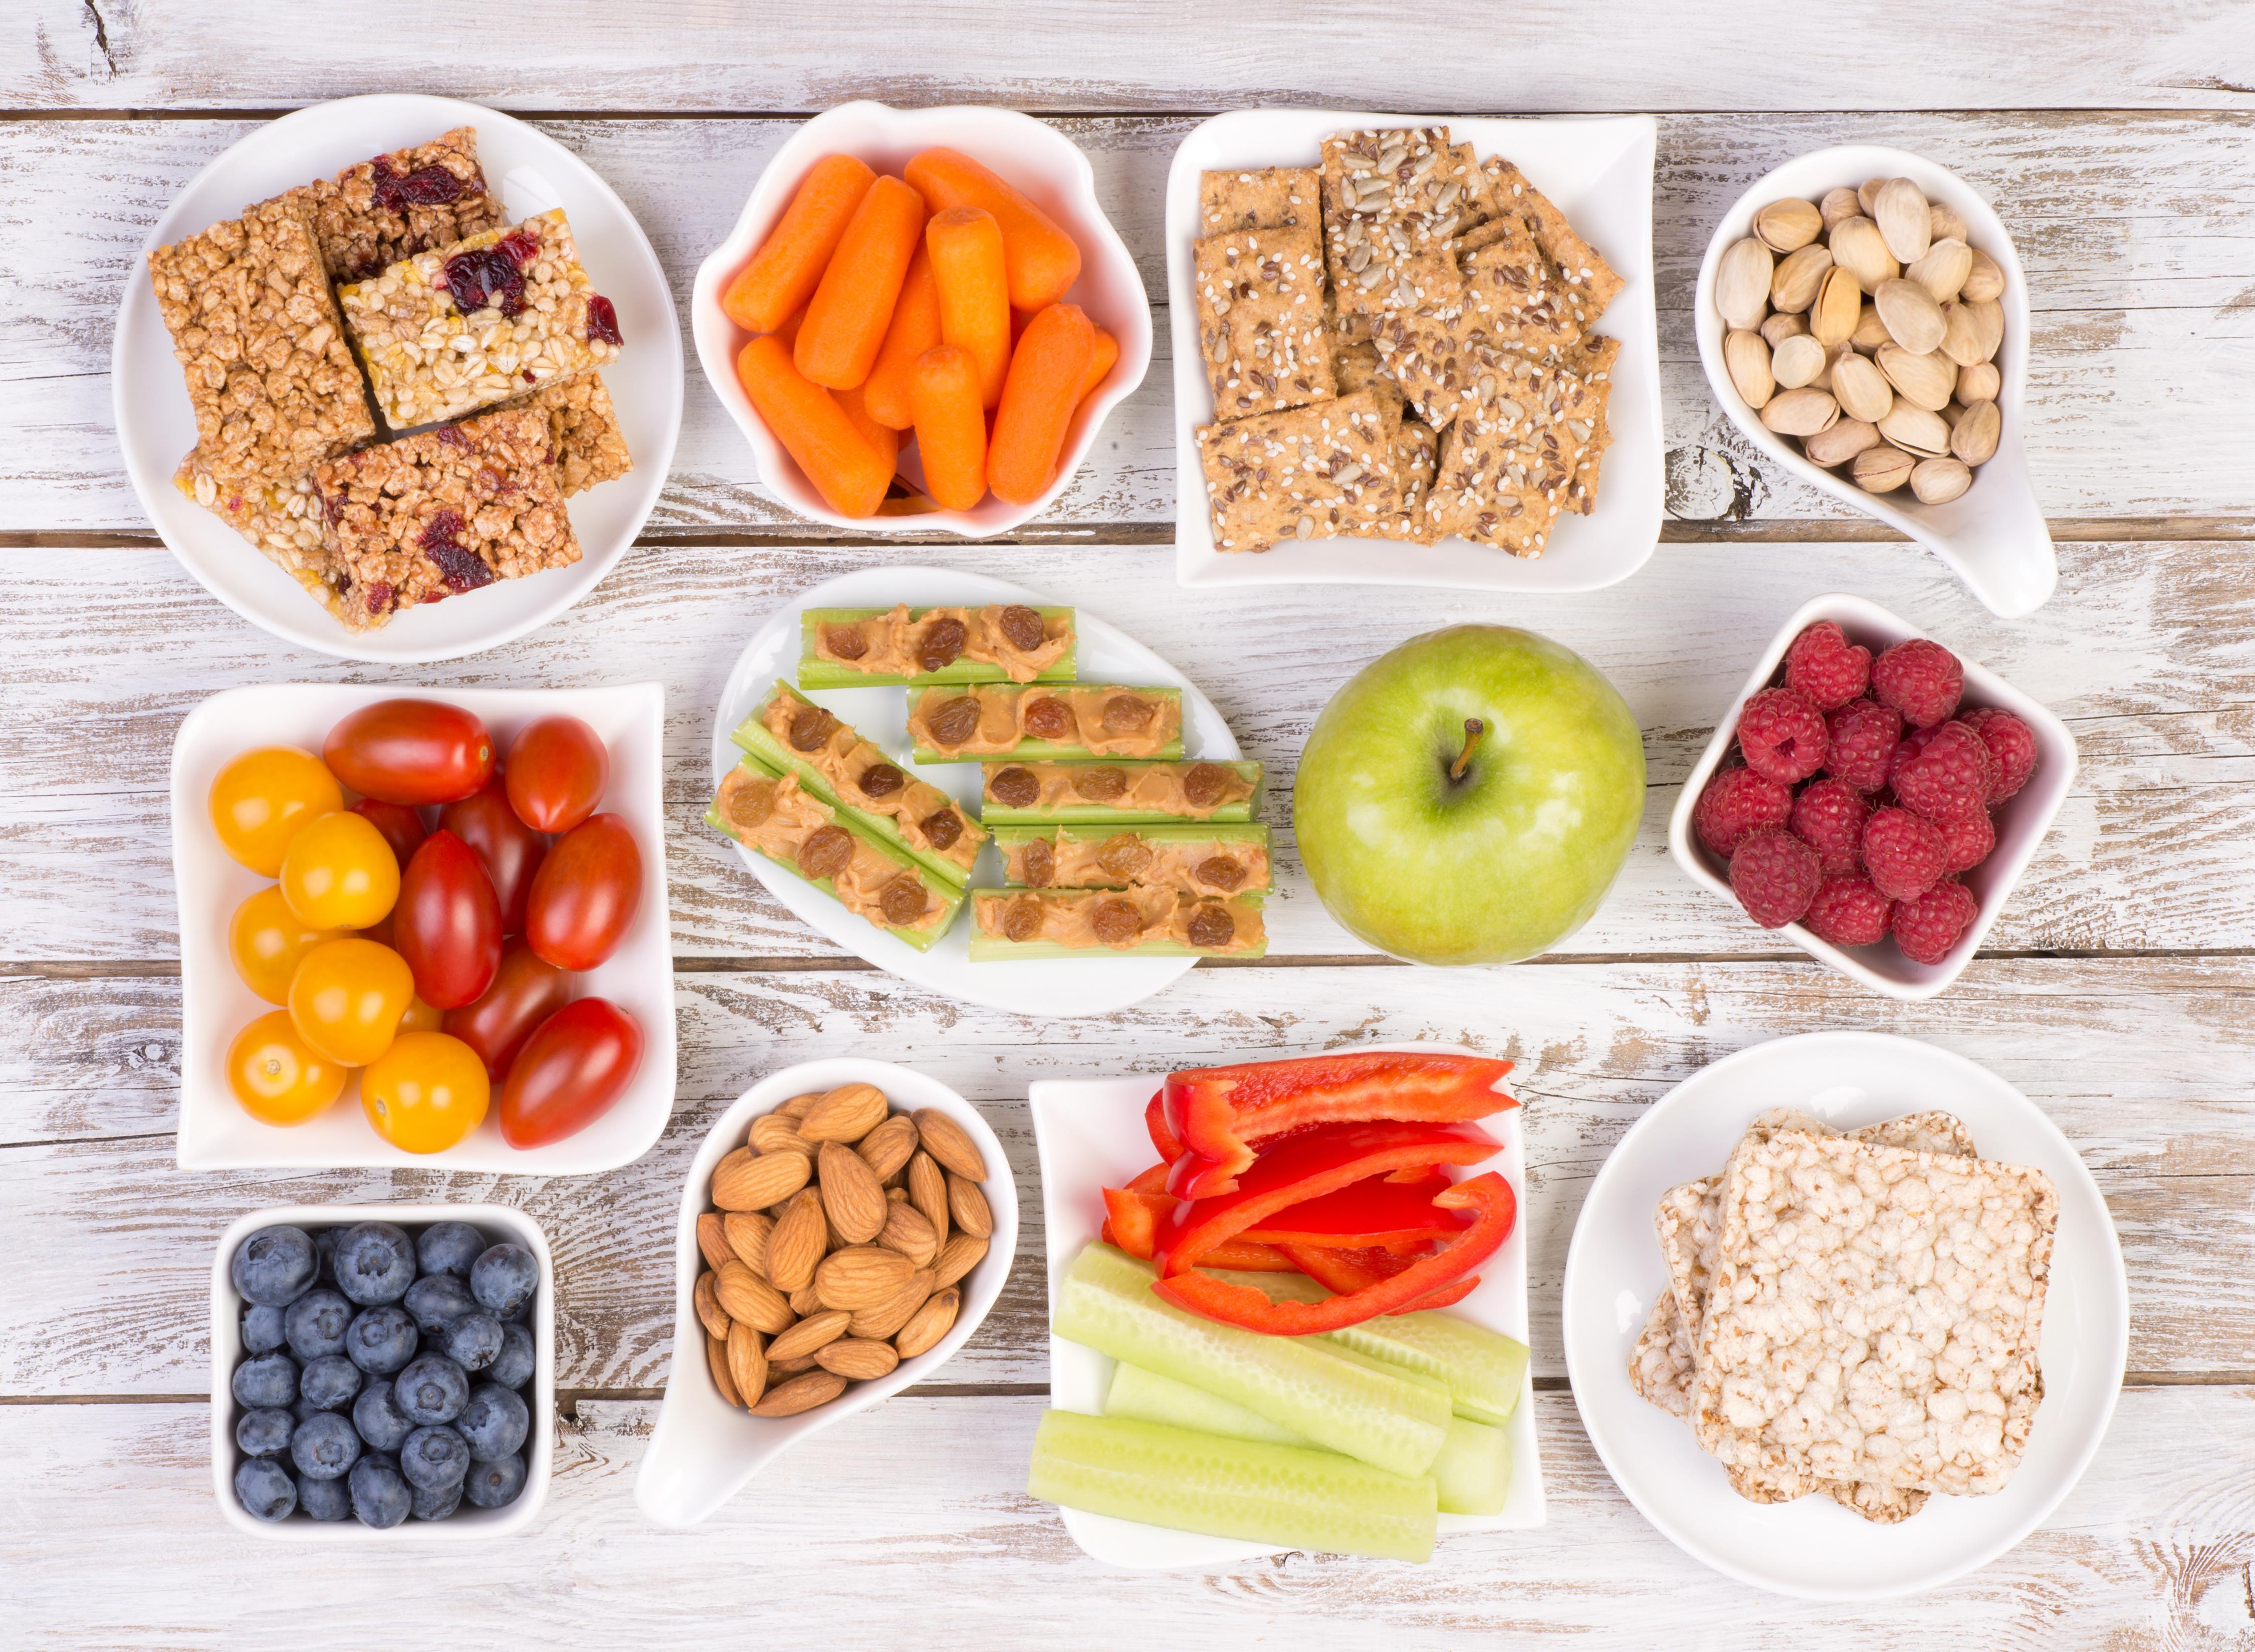 Filling Healthy Snacks  Five Filling Snacks to Help You Eat Healthy – karen sutton MD